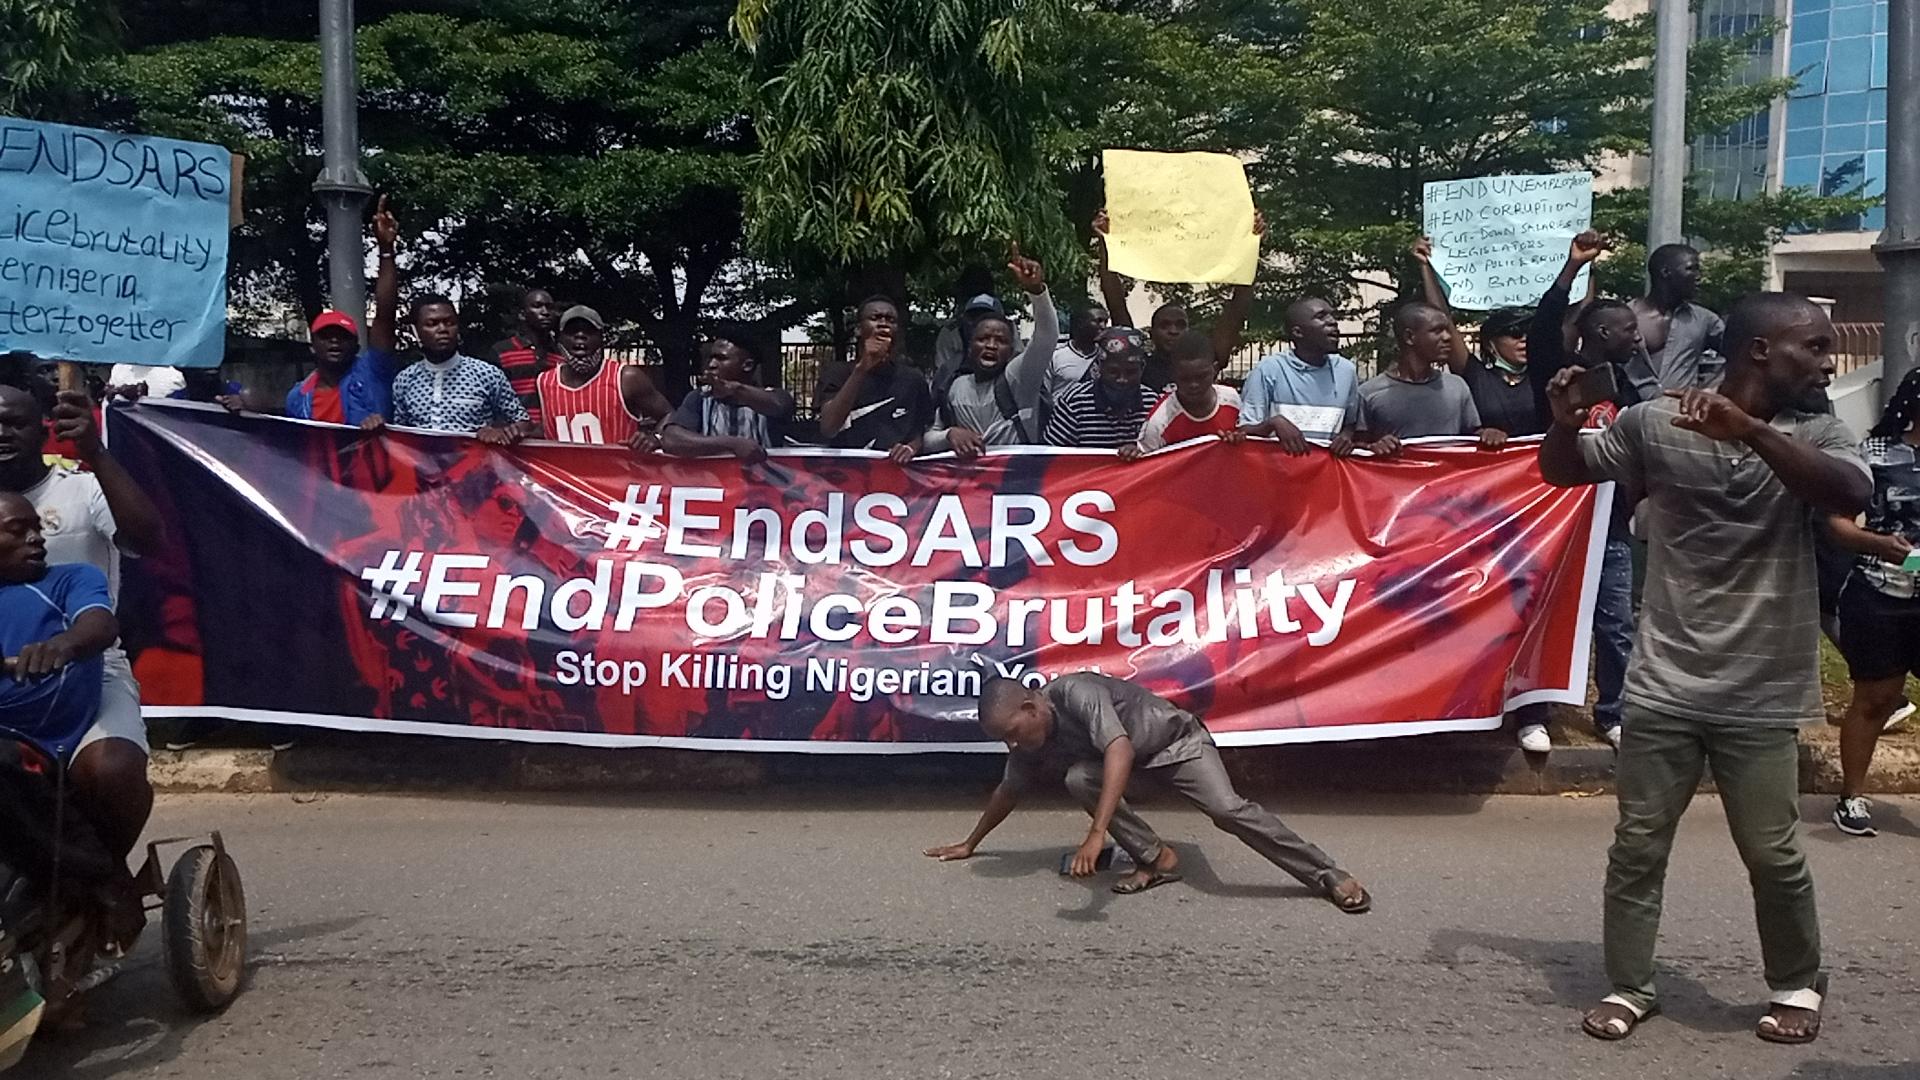 EndSARS protest: Court stops criminal case against Davido, Falz, 48 other activists, celebrities